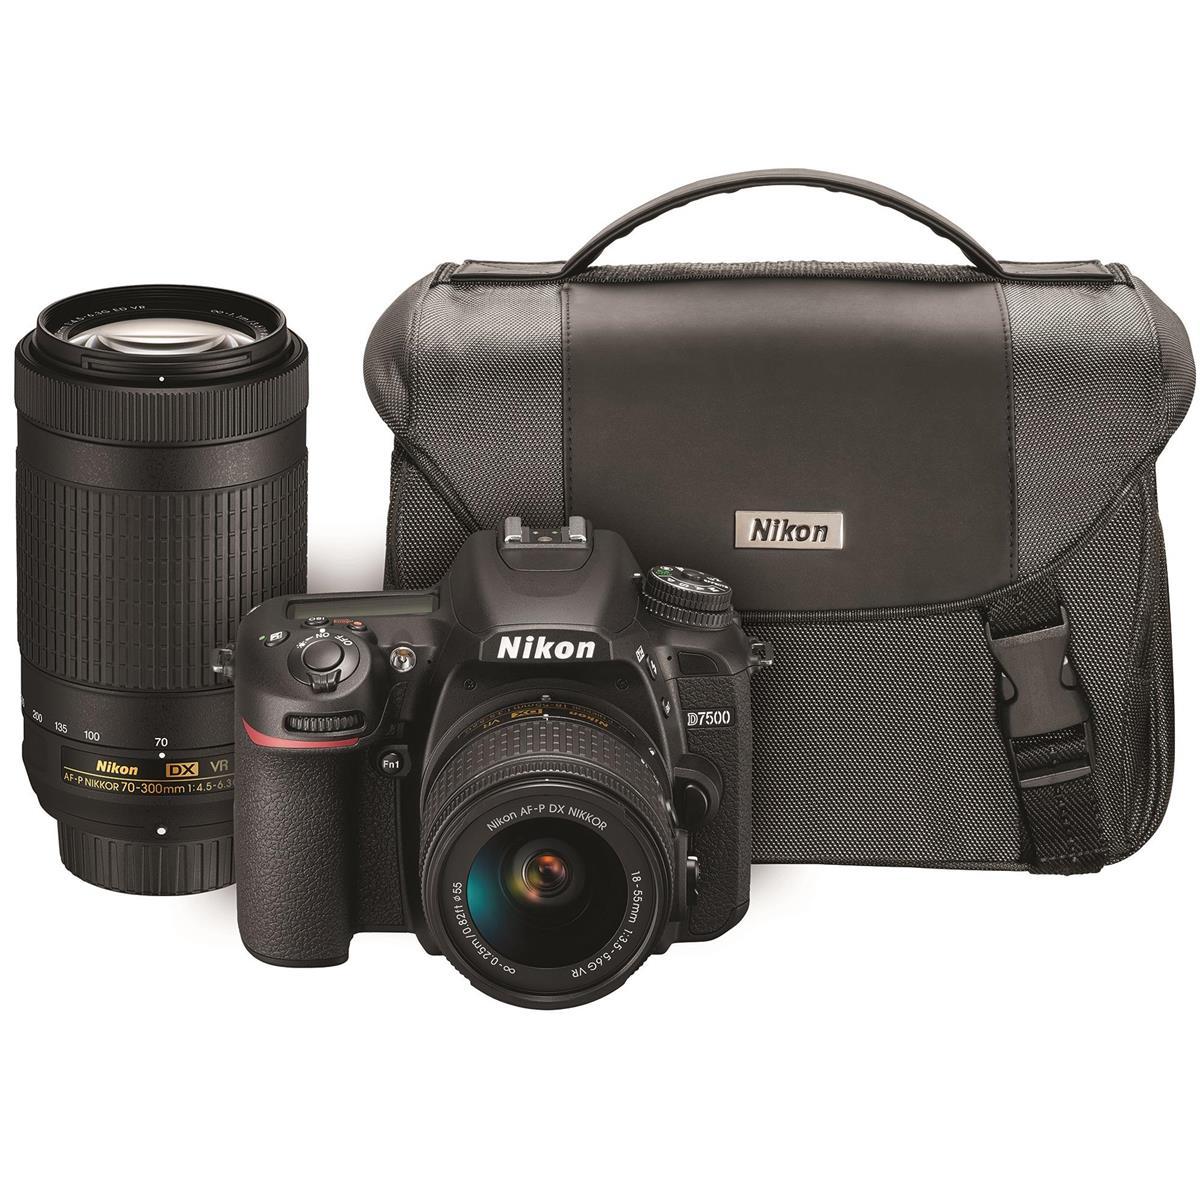 Nikon/13543.jpg